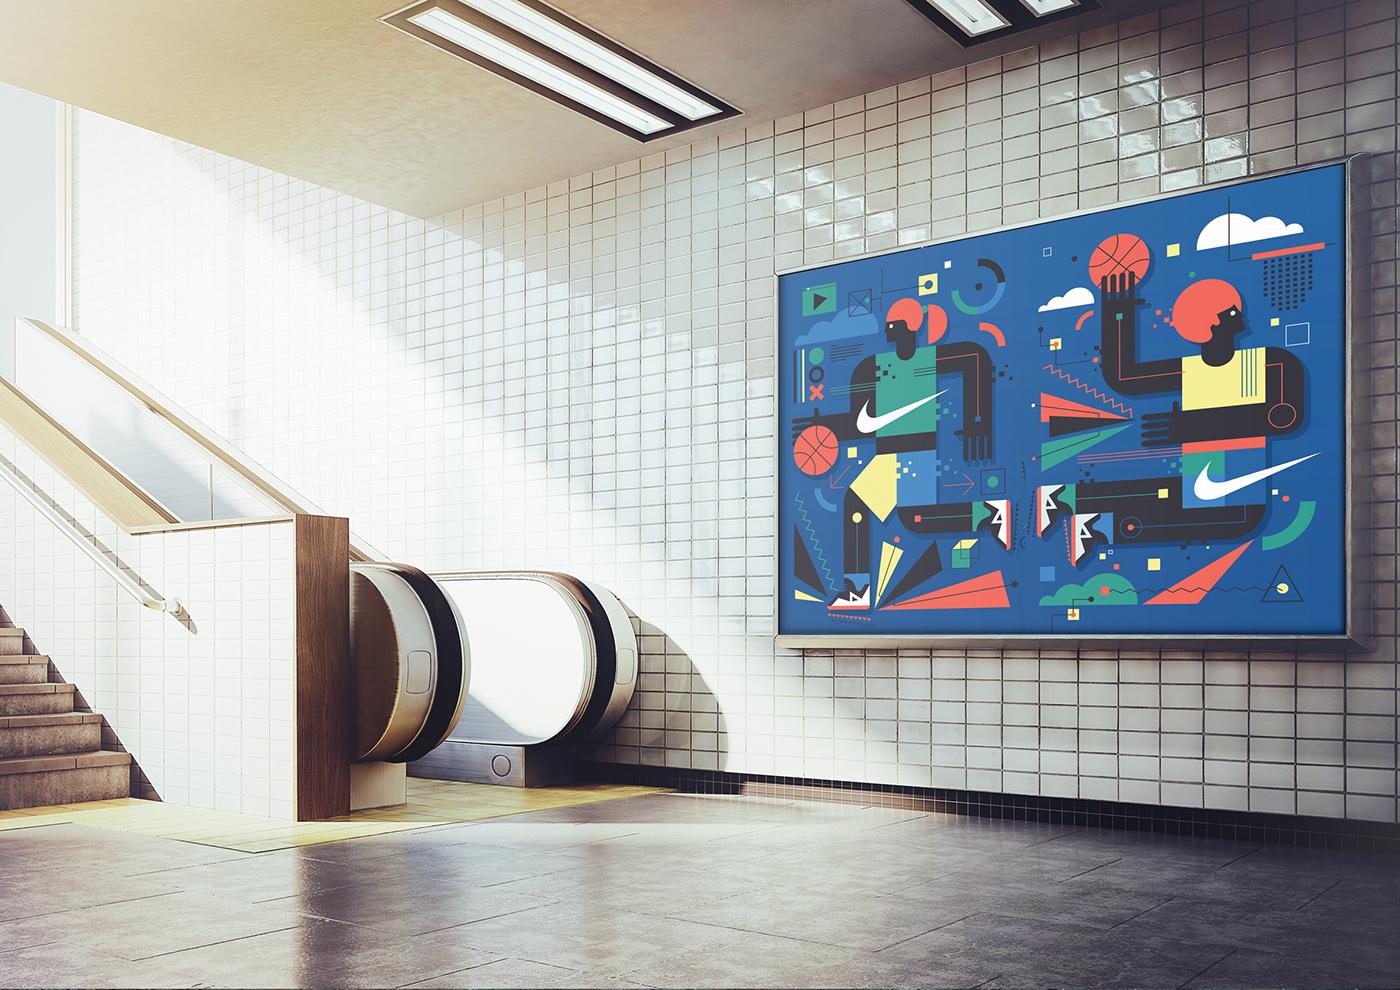 Nike wall mural on behance for Basketball court wall mural